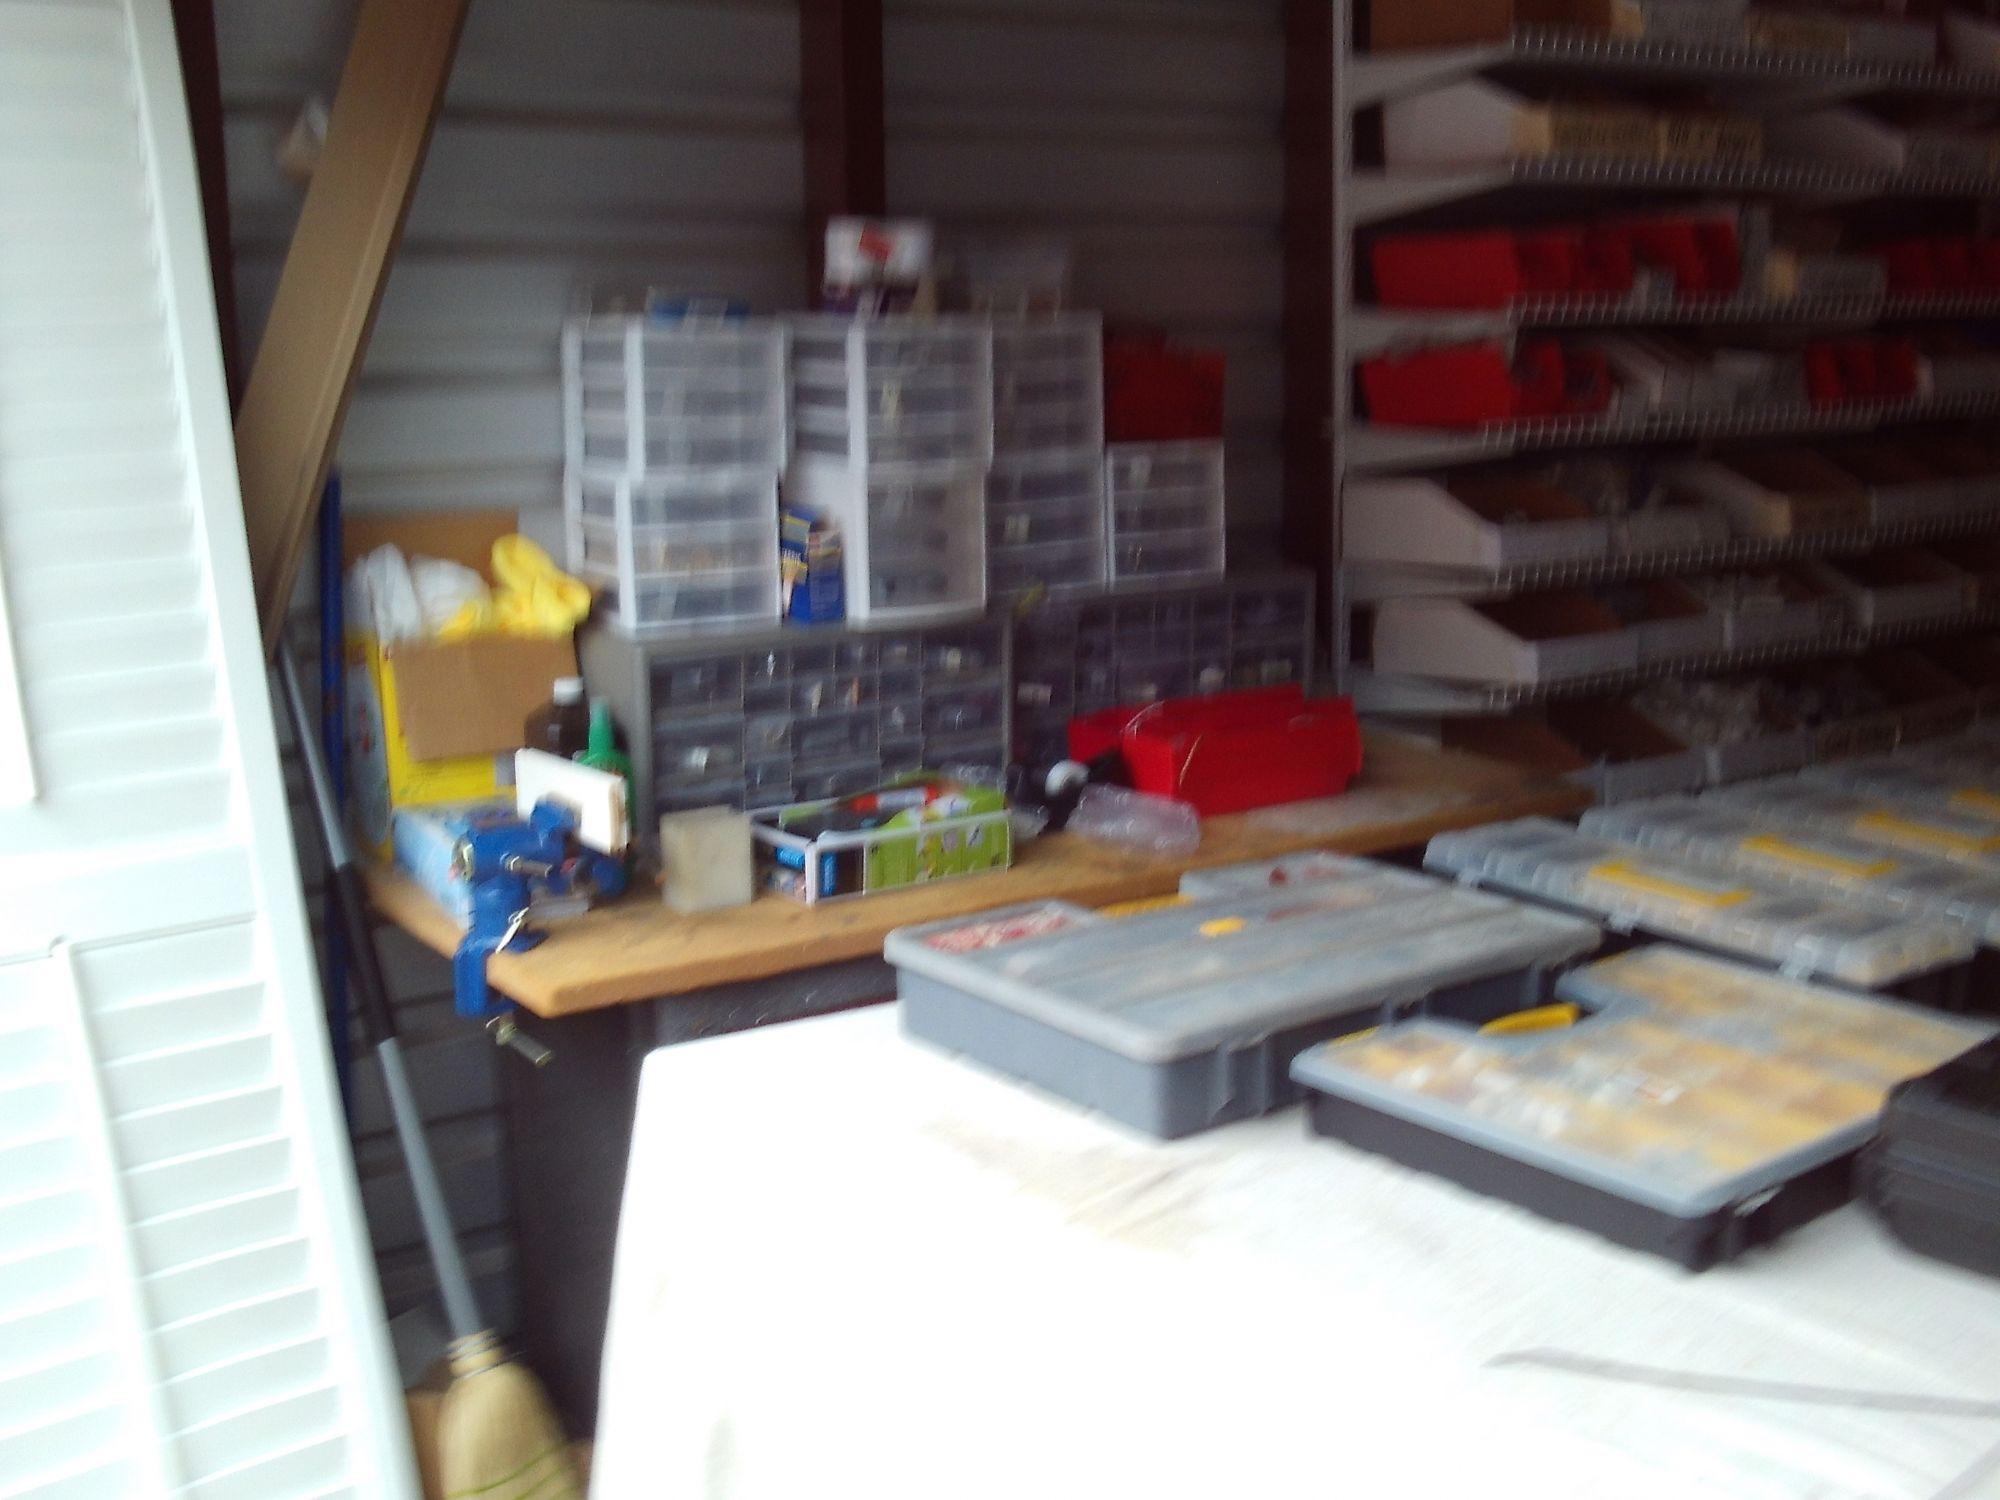 Storage Unit Auction 514898 Alpharetta Ga & Storage Units In Alpharetta Ga - Listitdallas